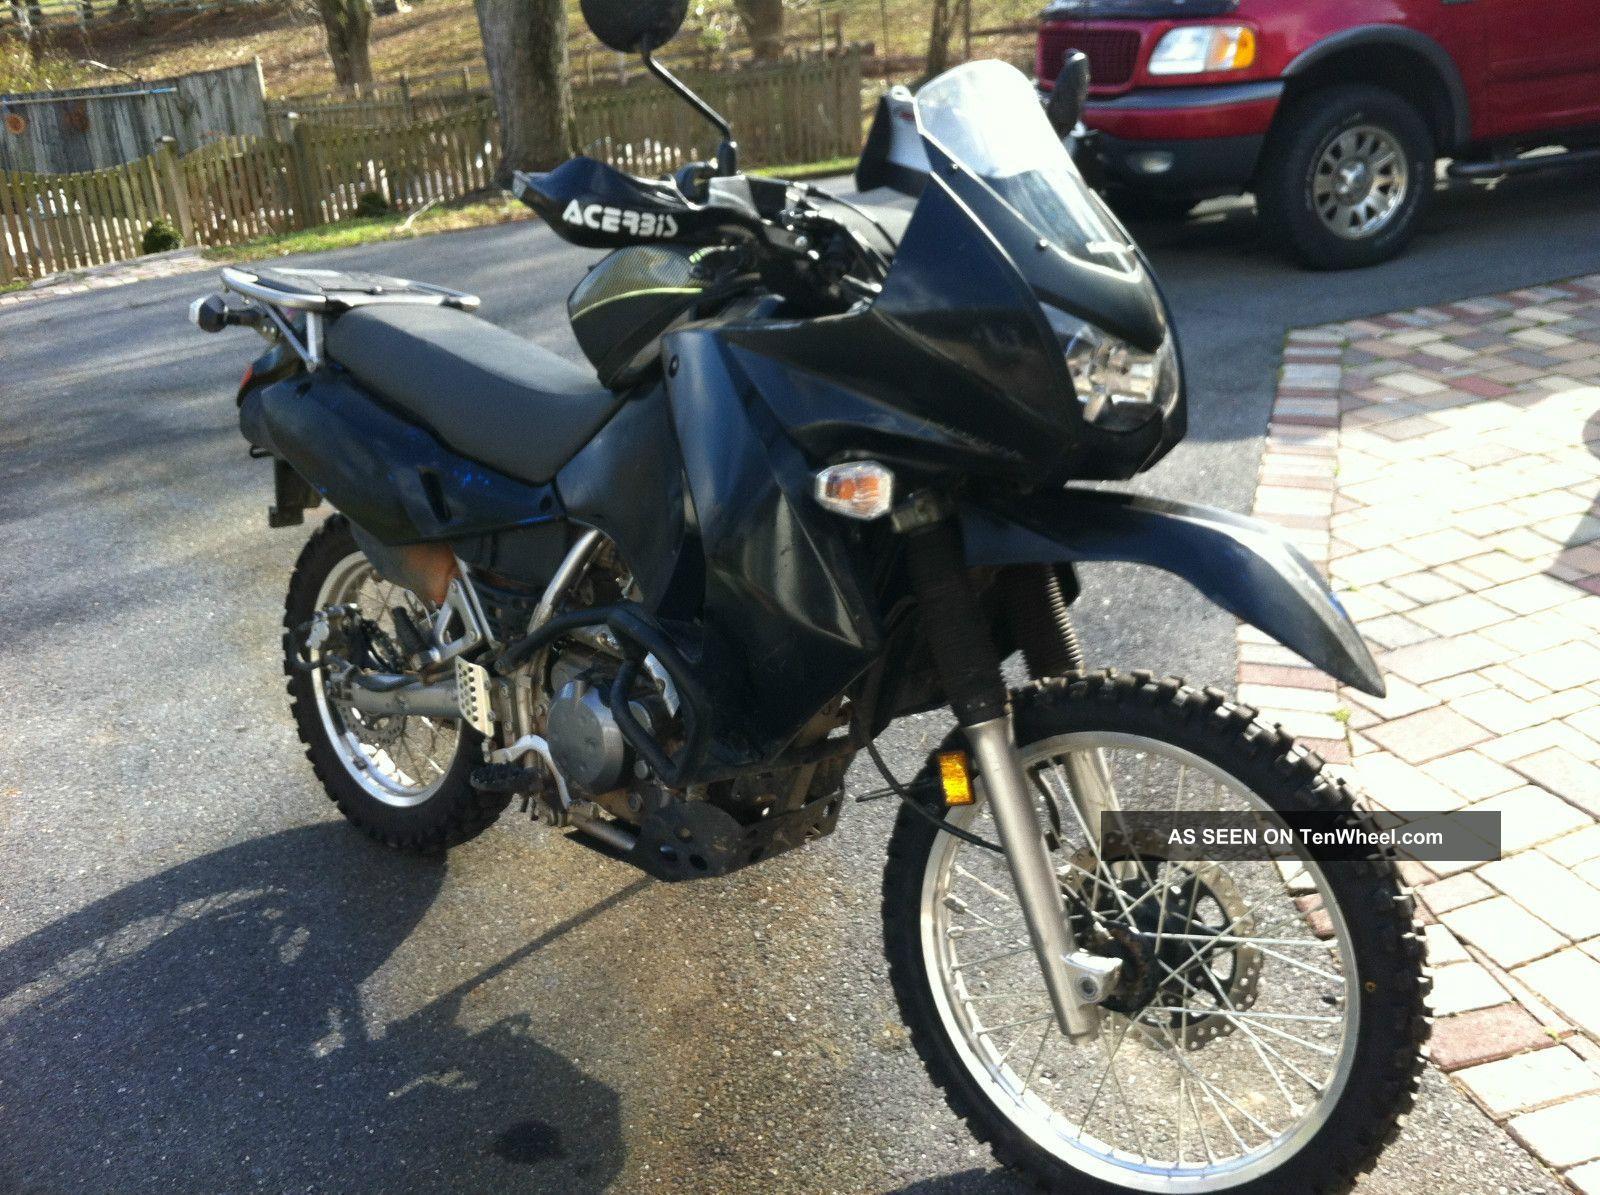 hight resolution of klr 650 off road 2008 black kawasaki klr 650 dual sport great on and off road bike